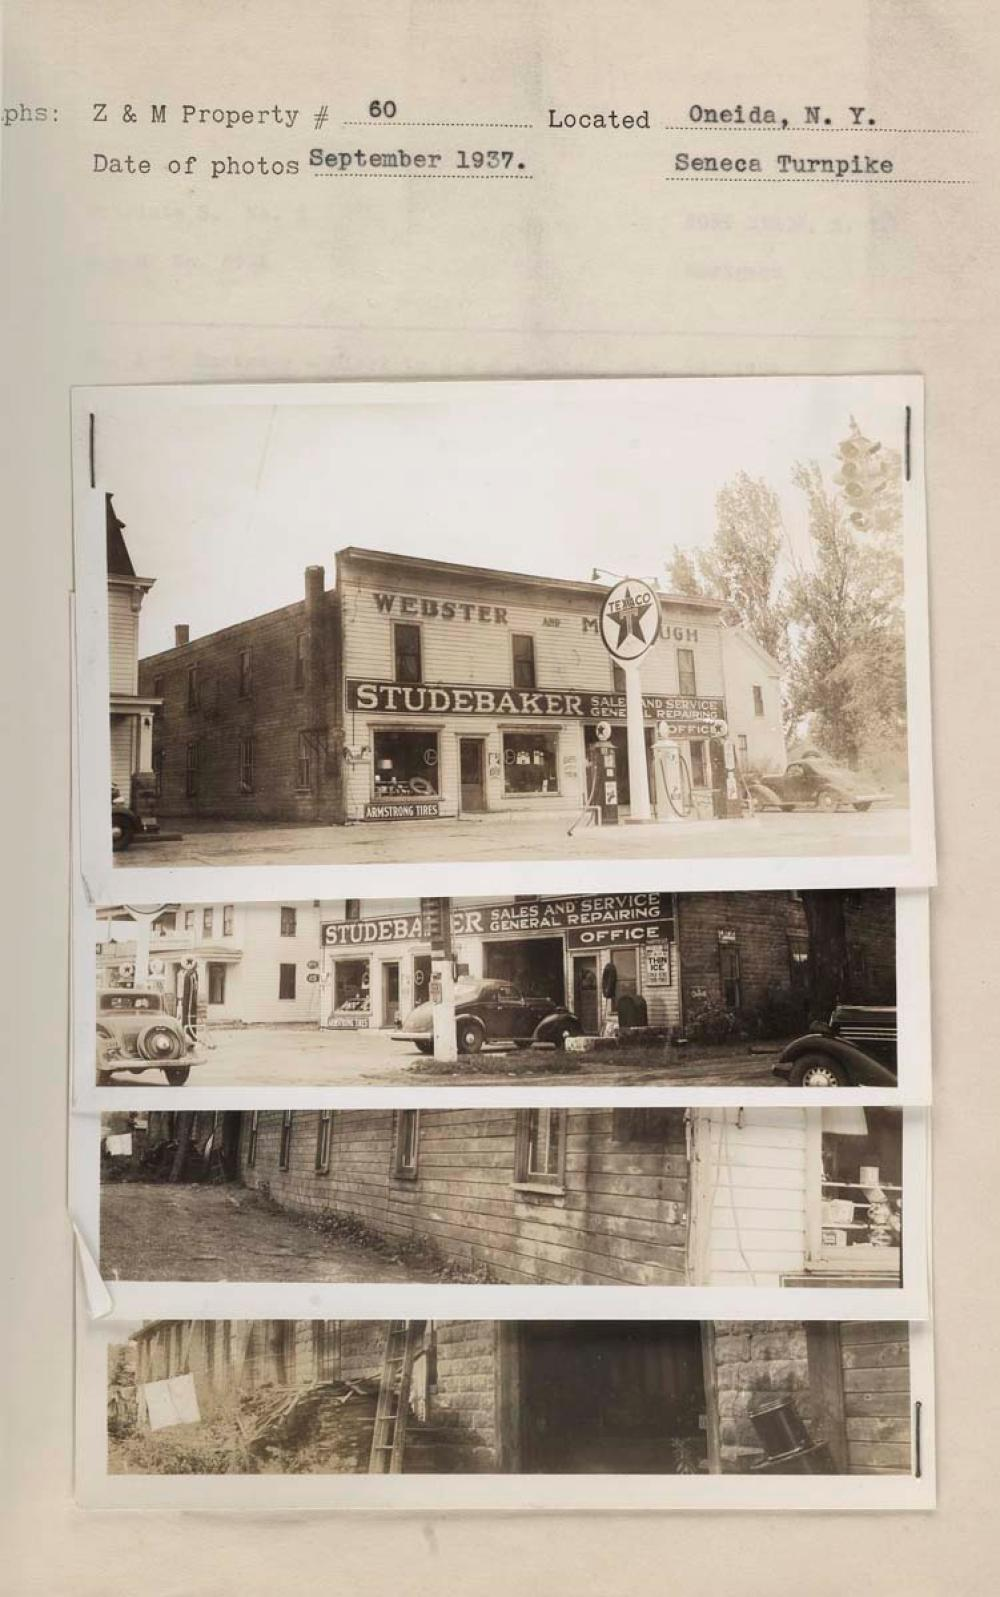 GAS STATIONS--TEXACO) Abum with 320 photographs of Texaco g